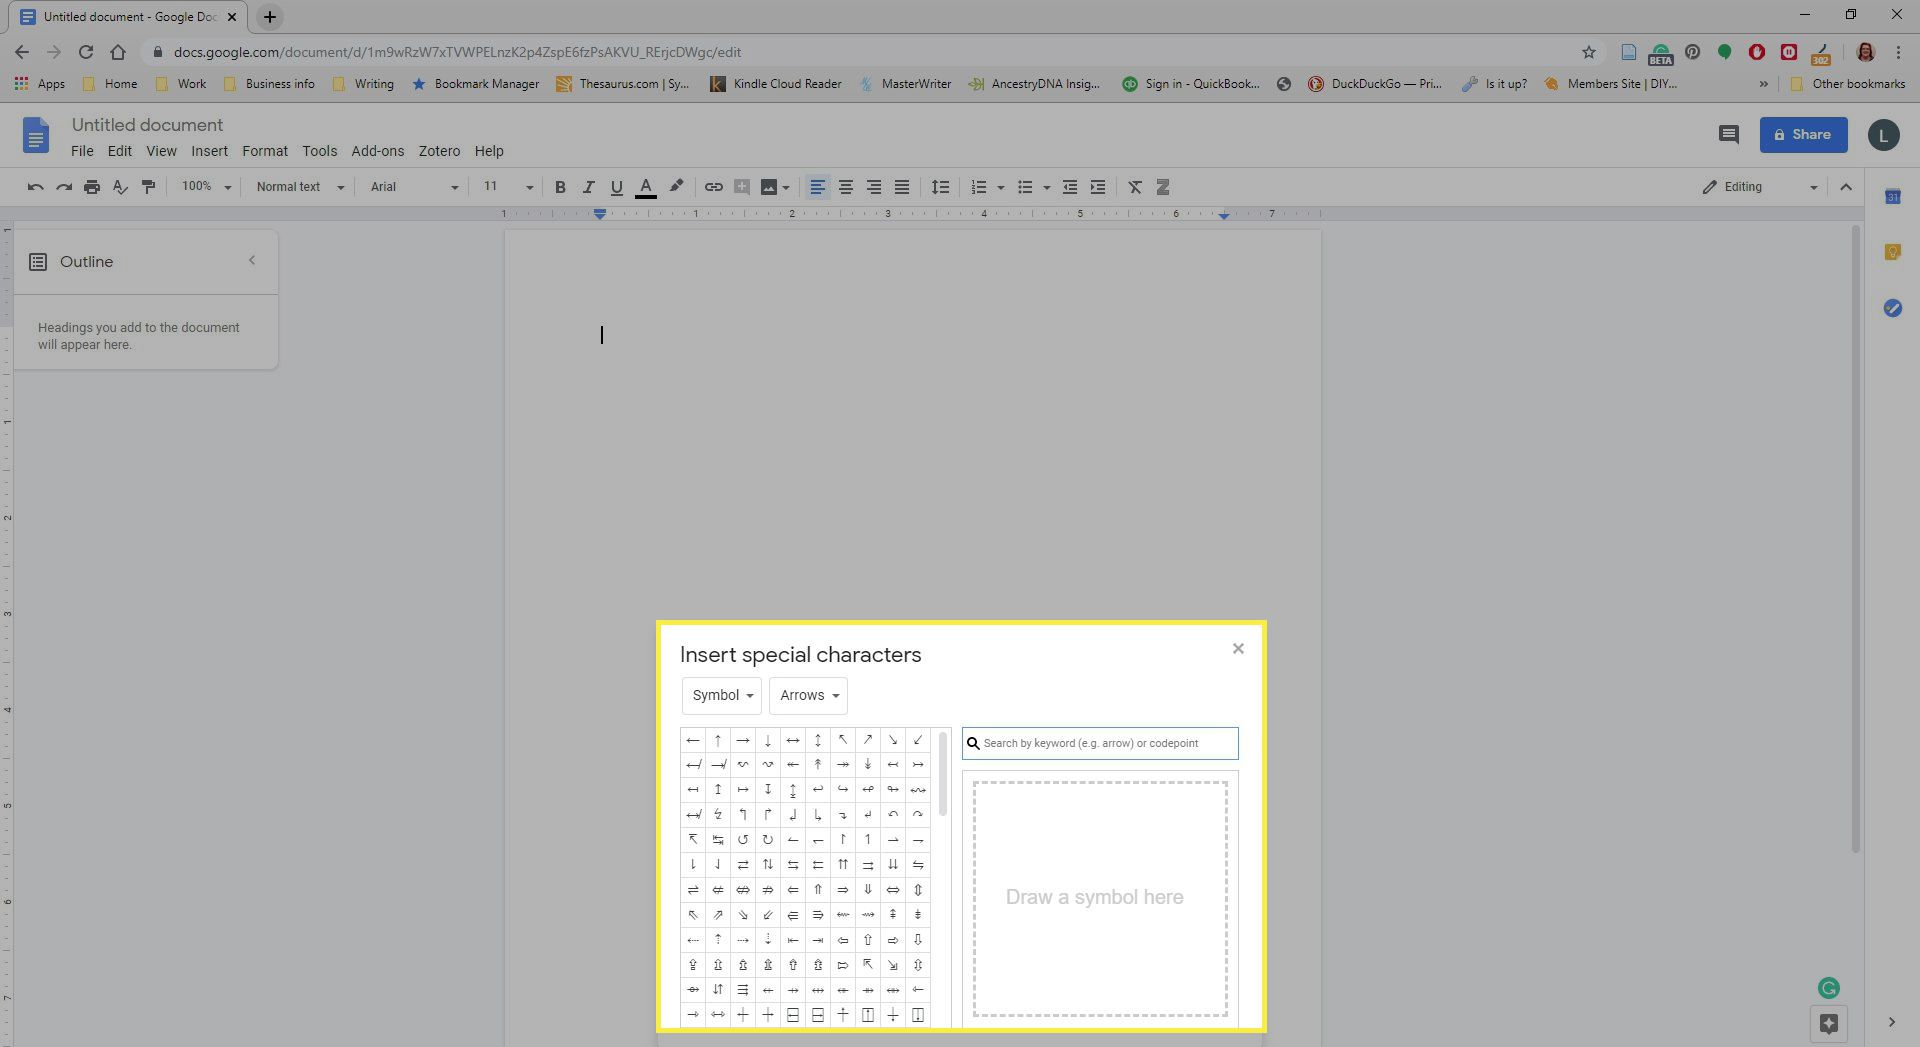 Special Characters Menu in Google Docs